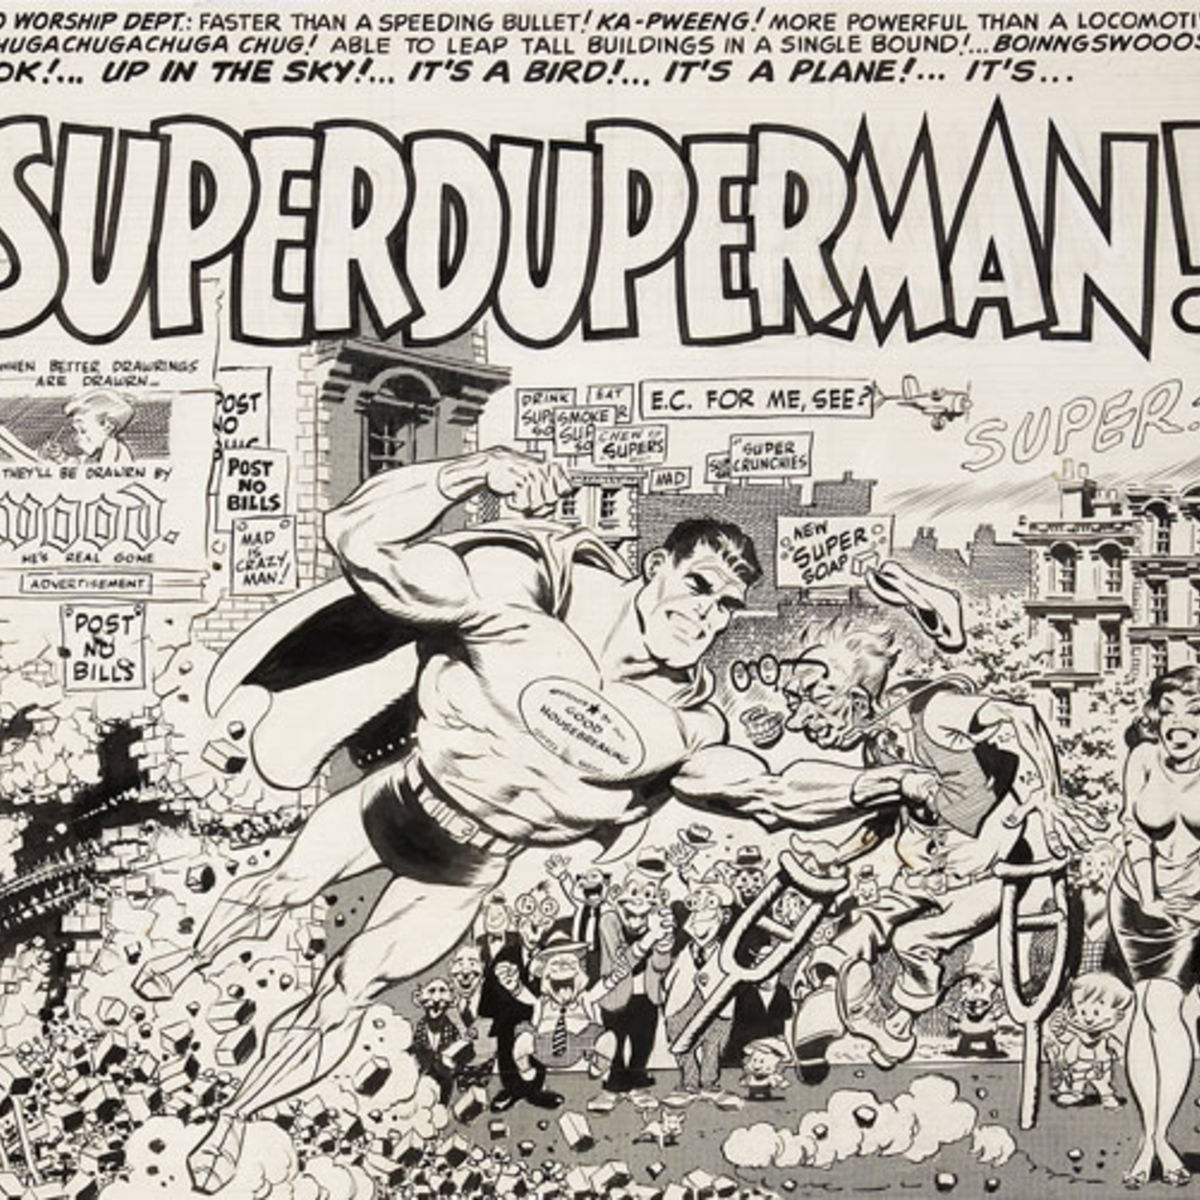 SuperMoore1.jpg